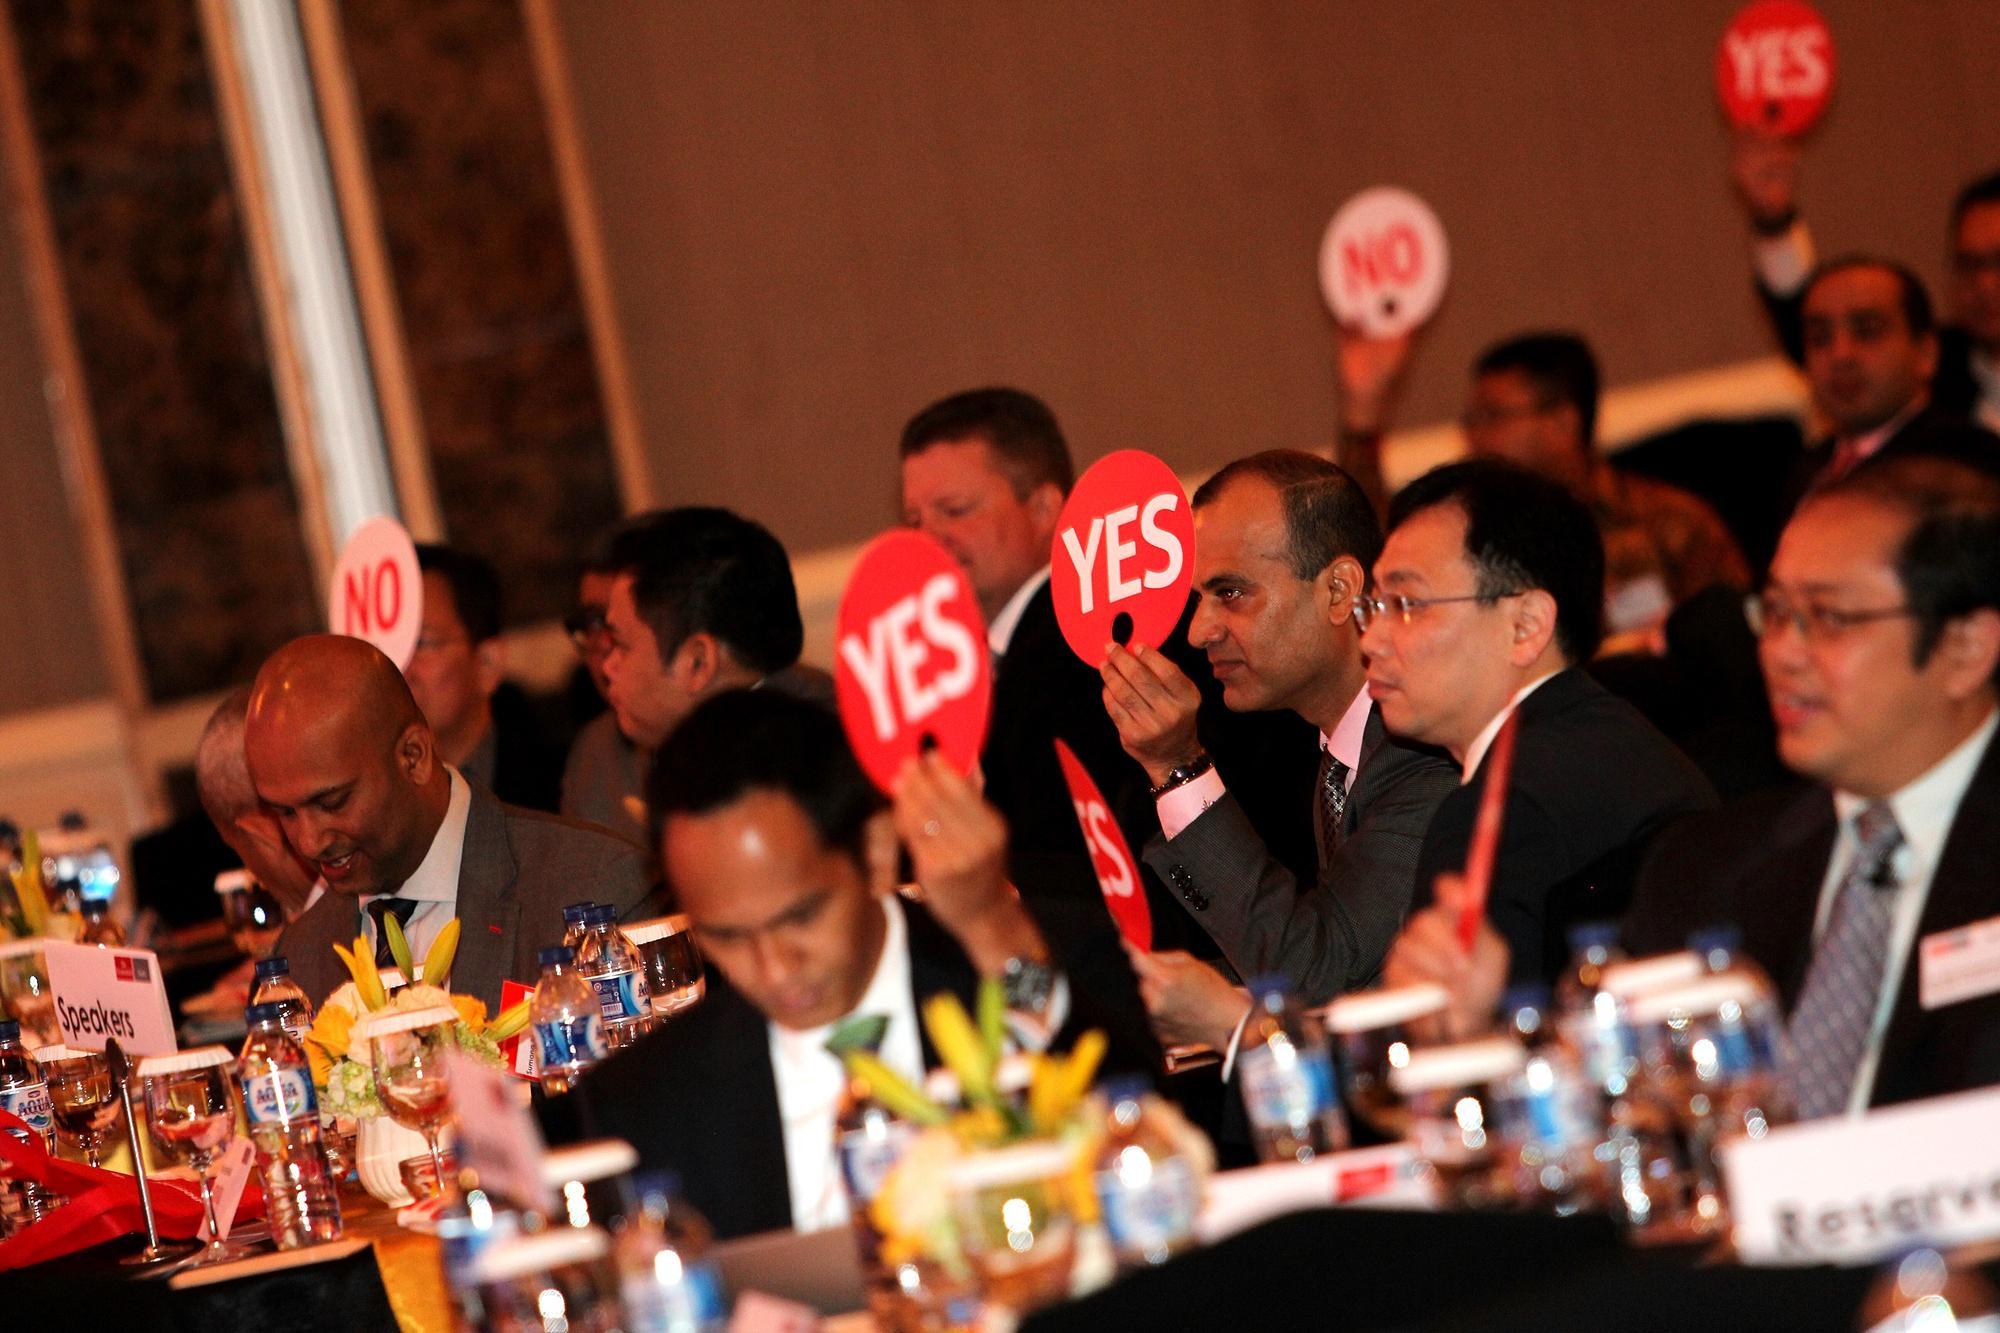 Suasana diskusi pada acara The Economist Events Indonesia Summit 2016 di Jakarta, Kamis, (24/02). Acara diselenggarakan oleh The Economist dan Katadata sebagai media partner Indonesia Summit 2016.